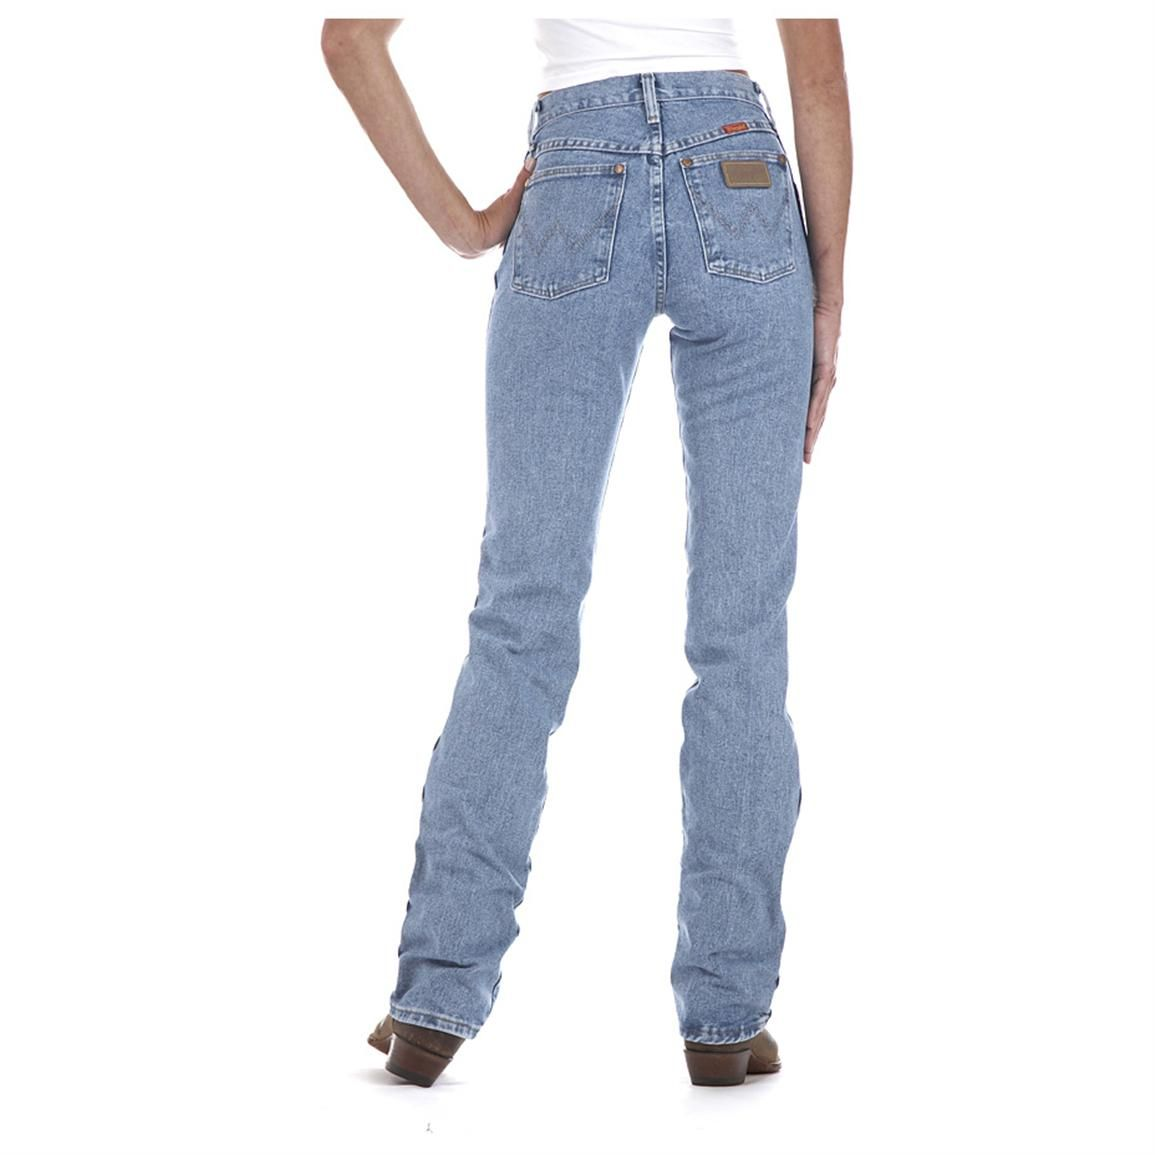 hot-selling cheap release date coupon codes women's wrangler jeans | Wrangler® Women's Cowboy Cut Slim ...